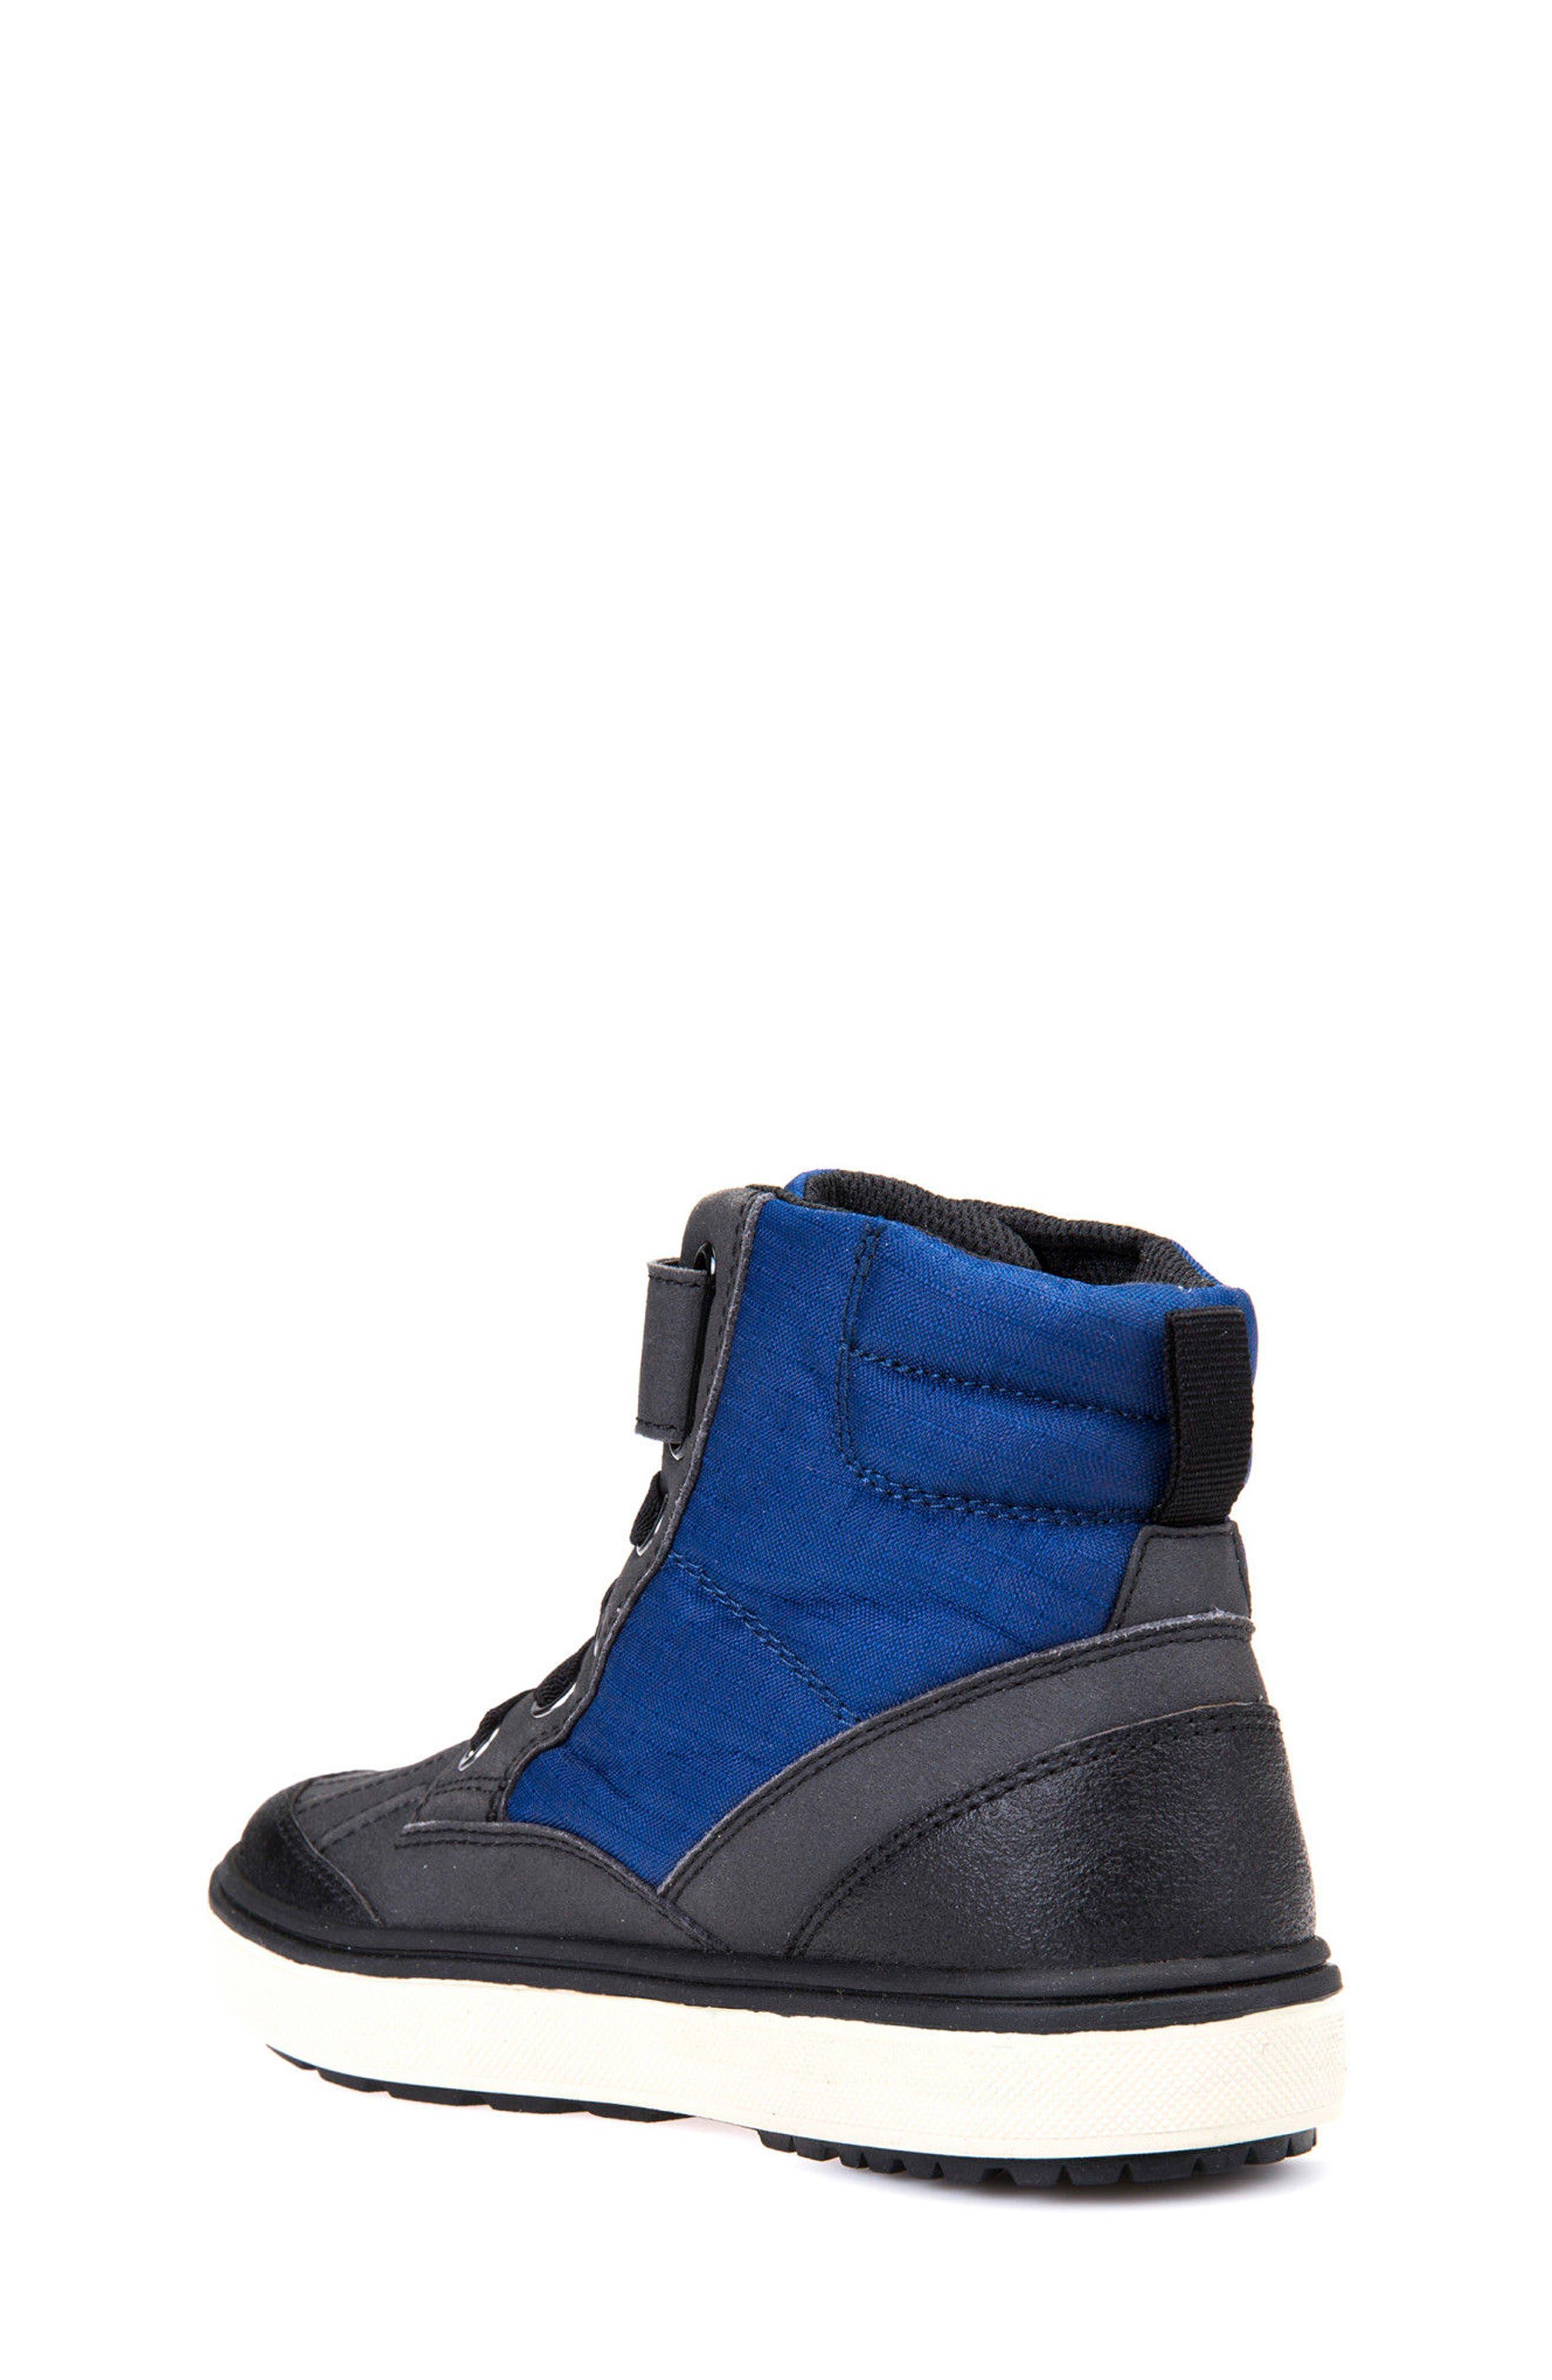 Alternate Image 2  - Geox 'Mattias - ABX' Amphibiox® Waterproof Sneaker (Toddler, Little Kid & Big Kid)